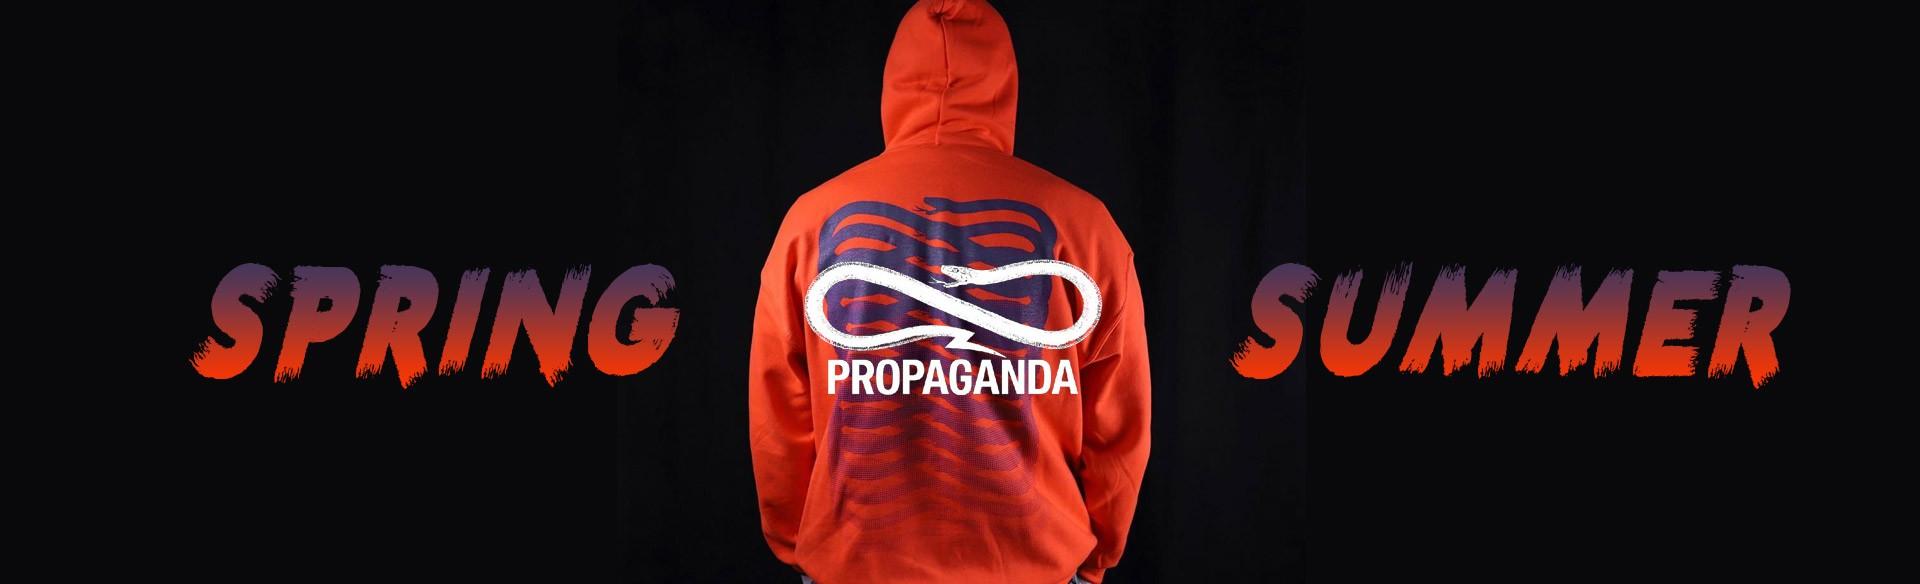 Propaganda Store Clothing